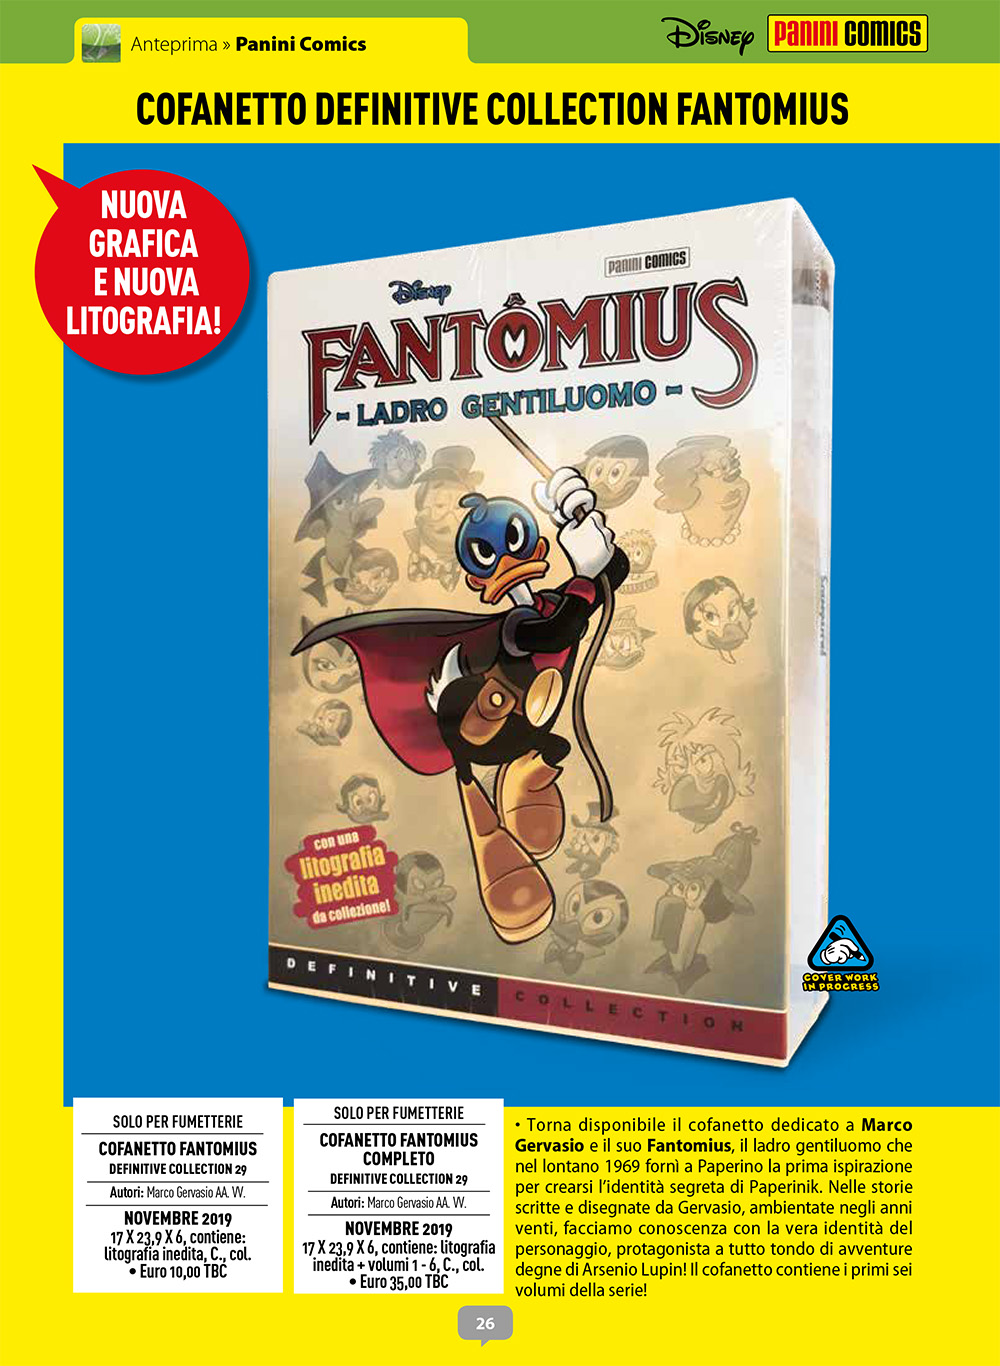 Cofanetto Fantomius